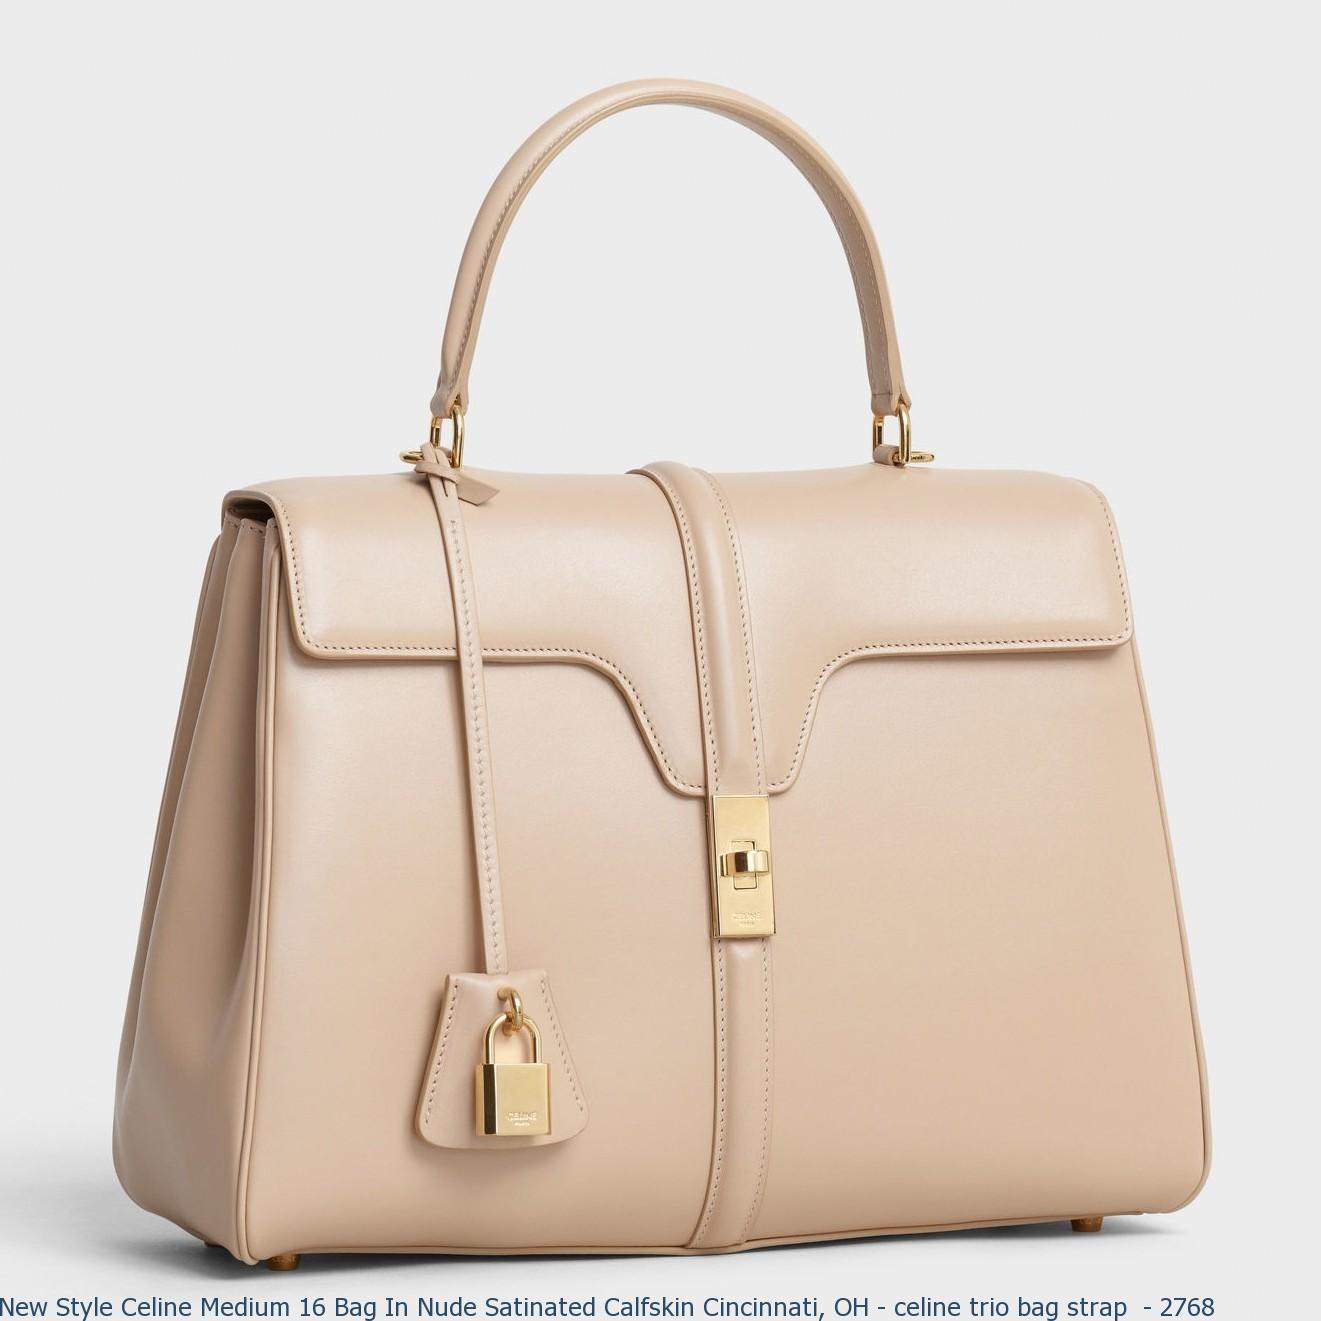 luxury fashion 50-70%off luxury New Style Celine Medium 16 Bag In Nude Satinated Calfskin Cincinnati, OH -  celine trio bag strap - 2768